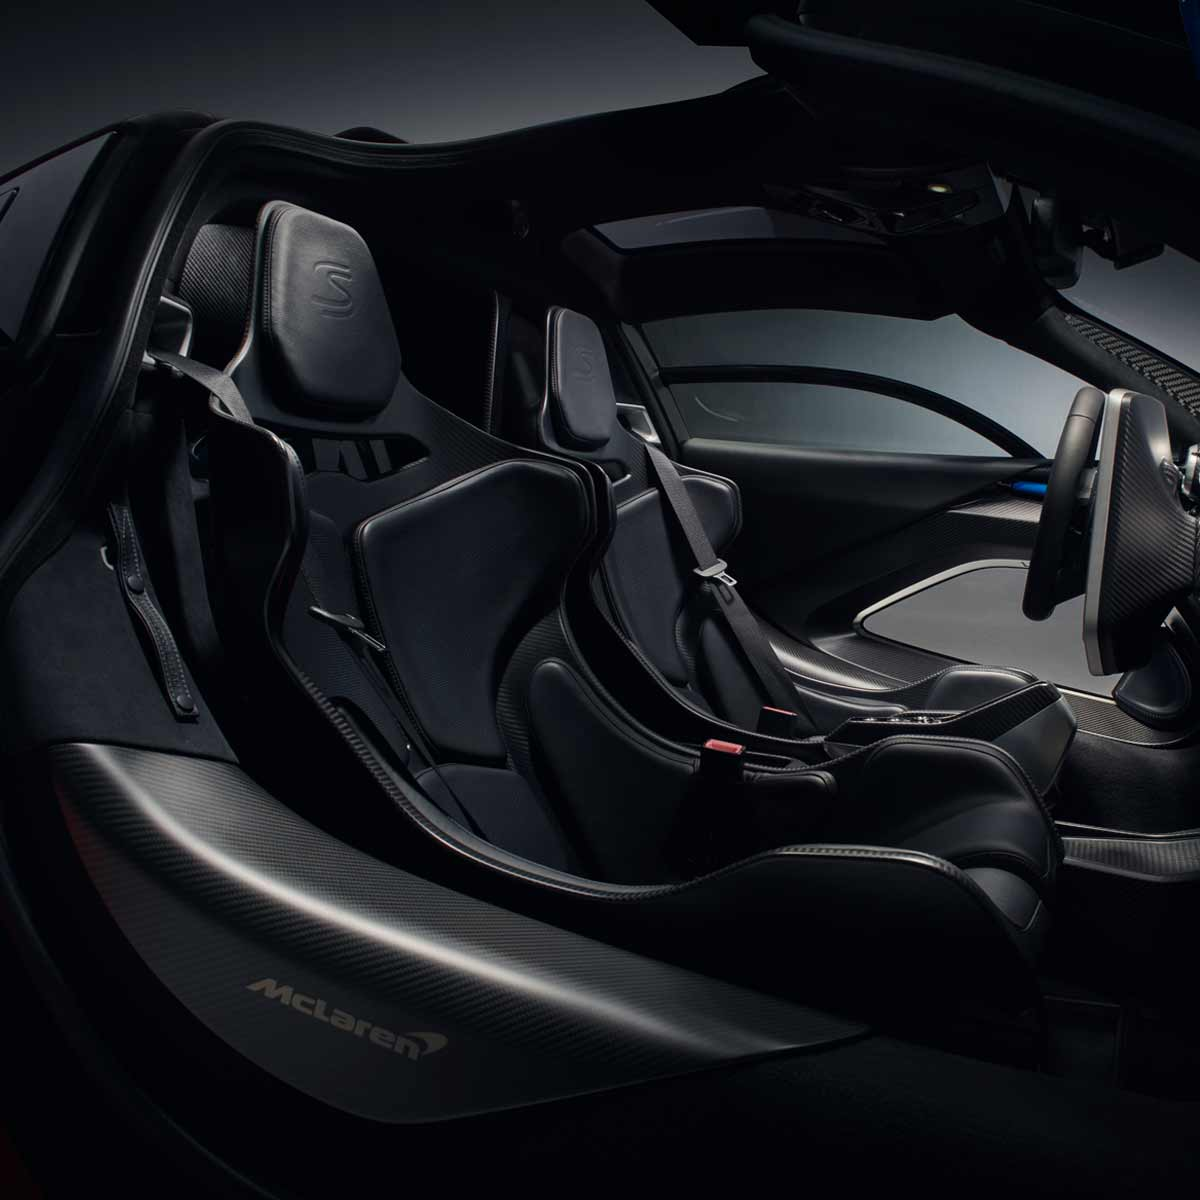 McLaren Senna - Innovation | McLaren Automotive